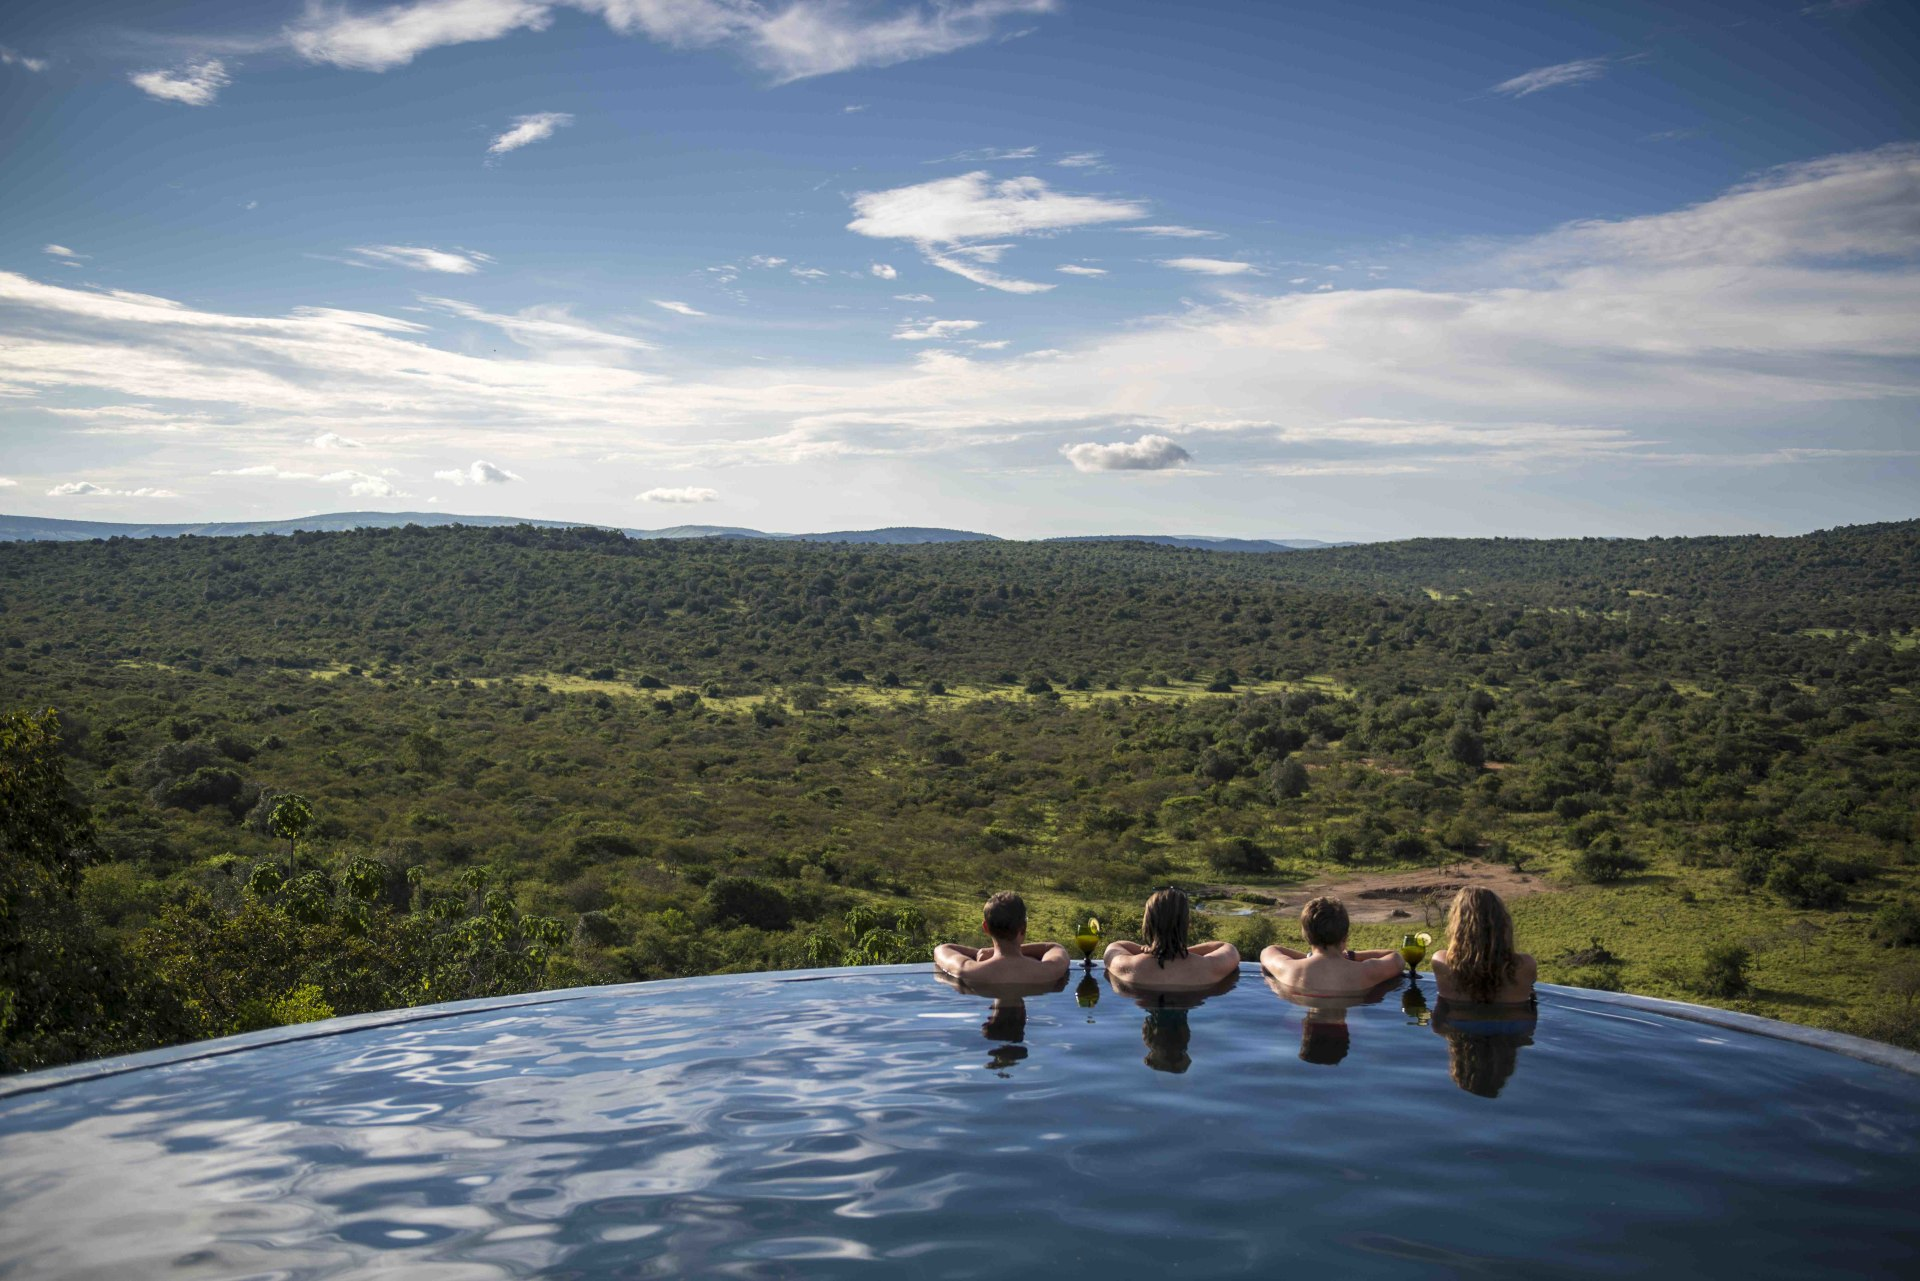 Swimmingpool der Mihingo Lodge